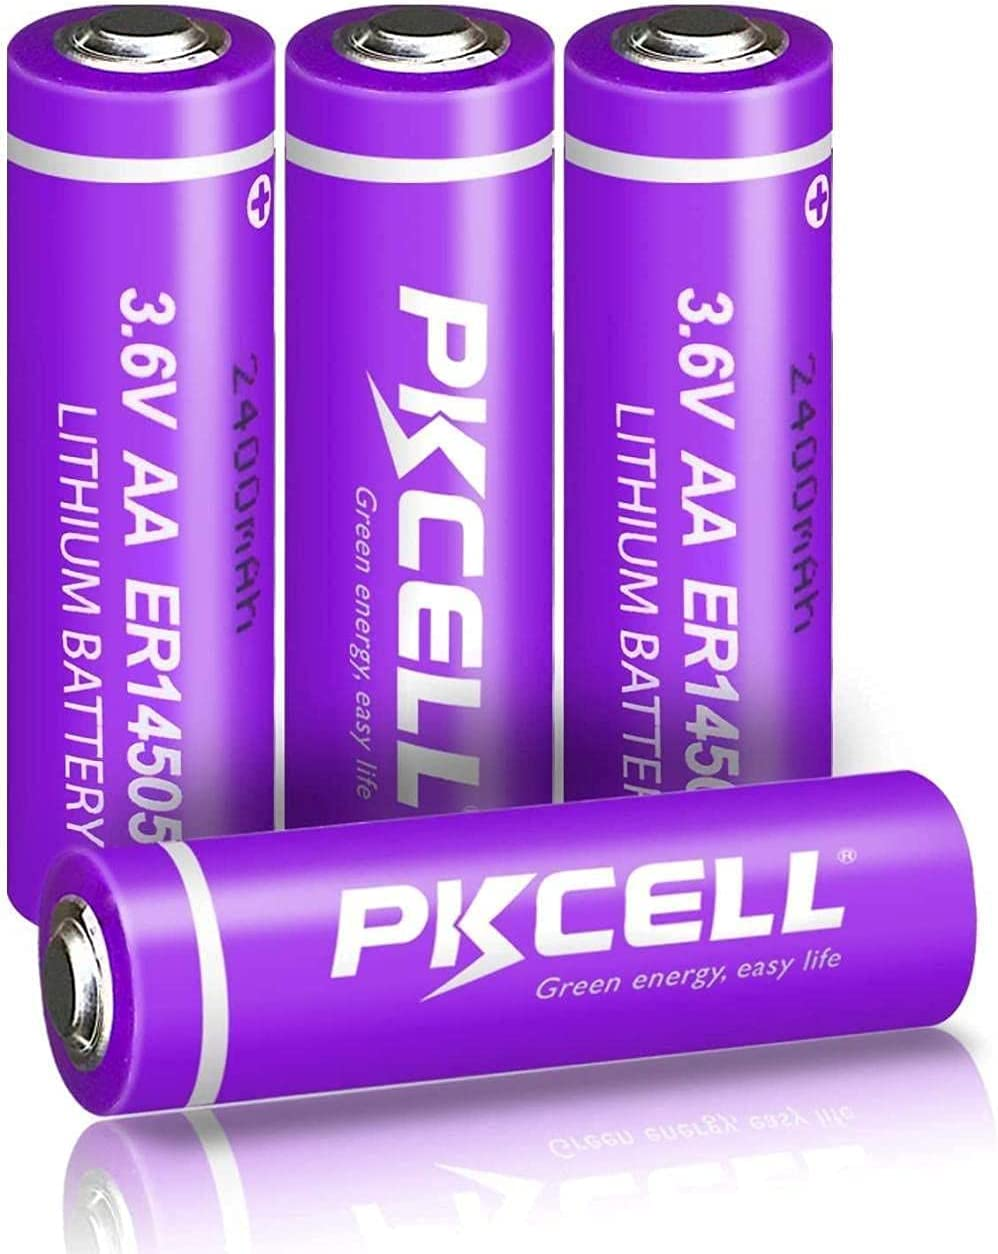 ER14505 14505 S14500 3.6V AA 4pcs 2400mAh Li-SOCl2 Price reduction Atlanta Mall Battery